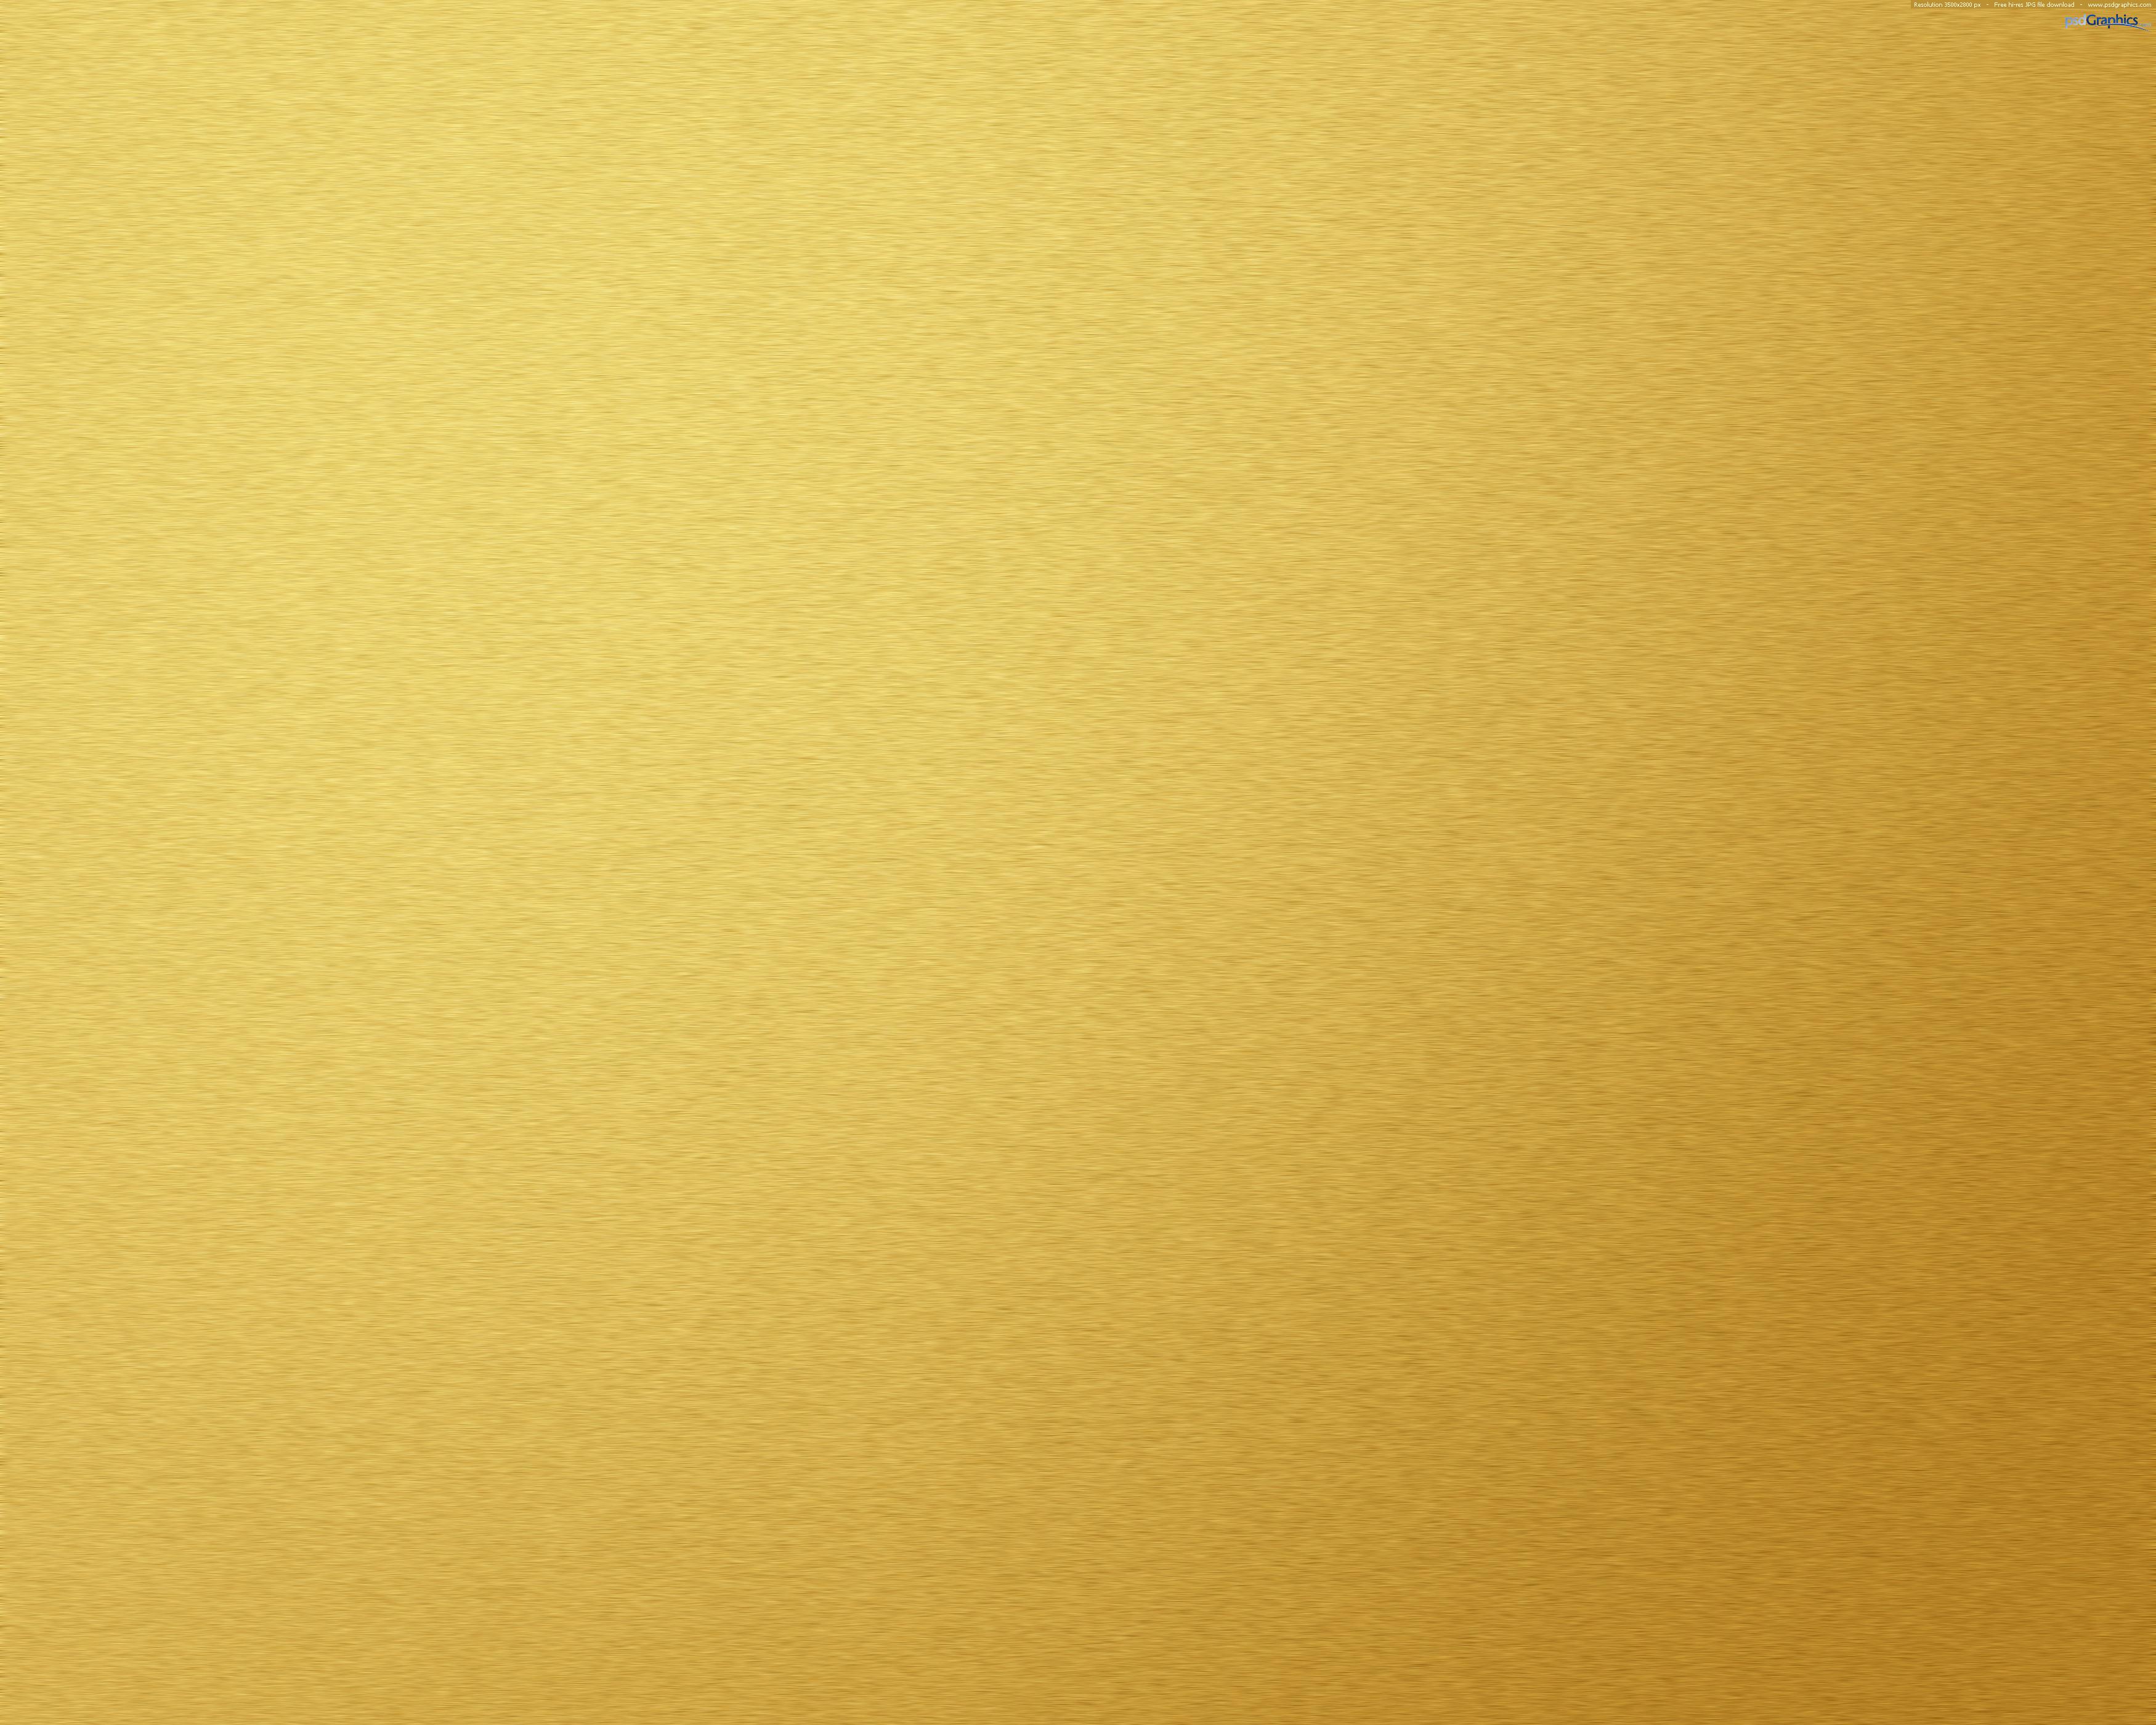 Dark Textures clipart golden texture Brushed PSDGraphics texture gold metal